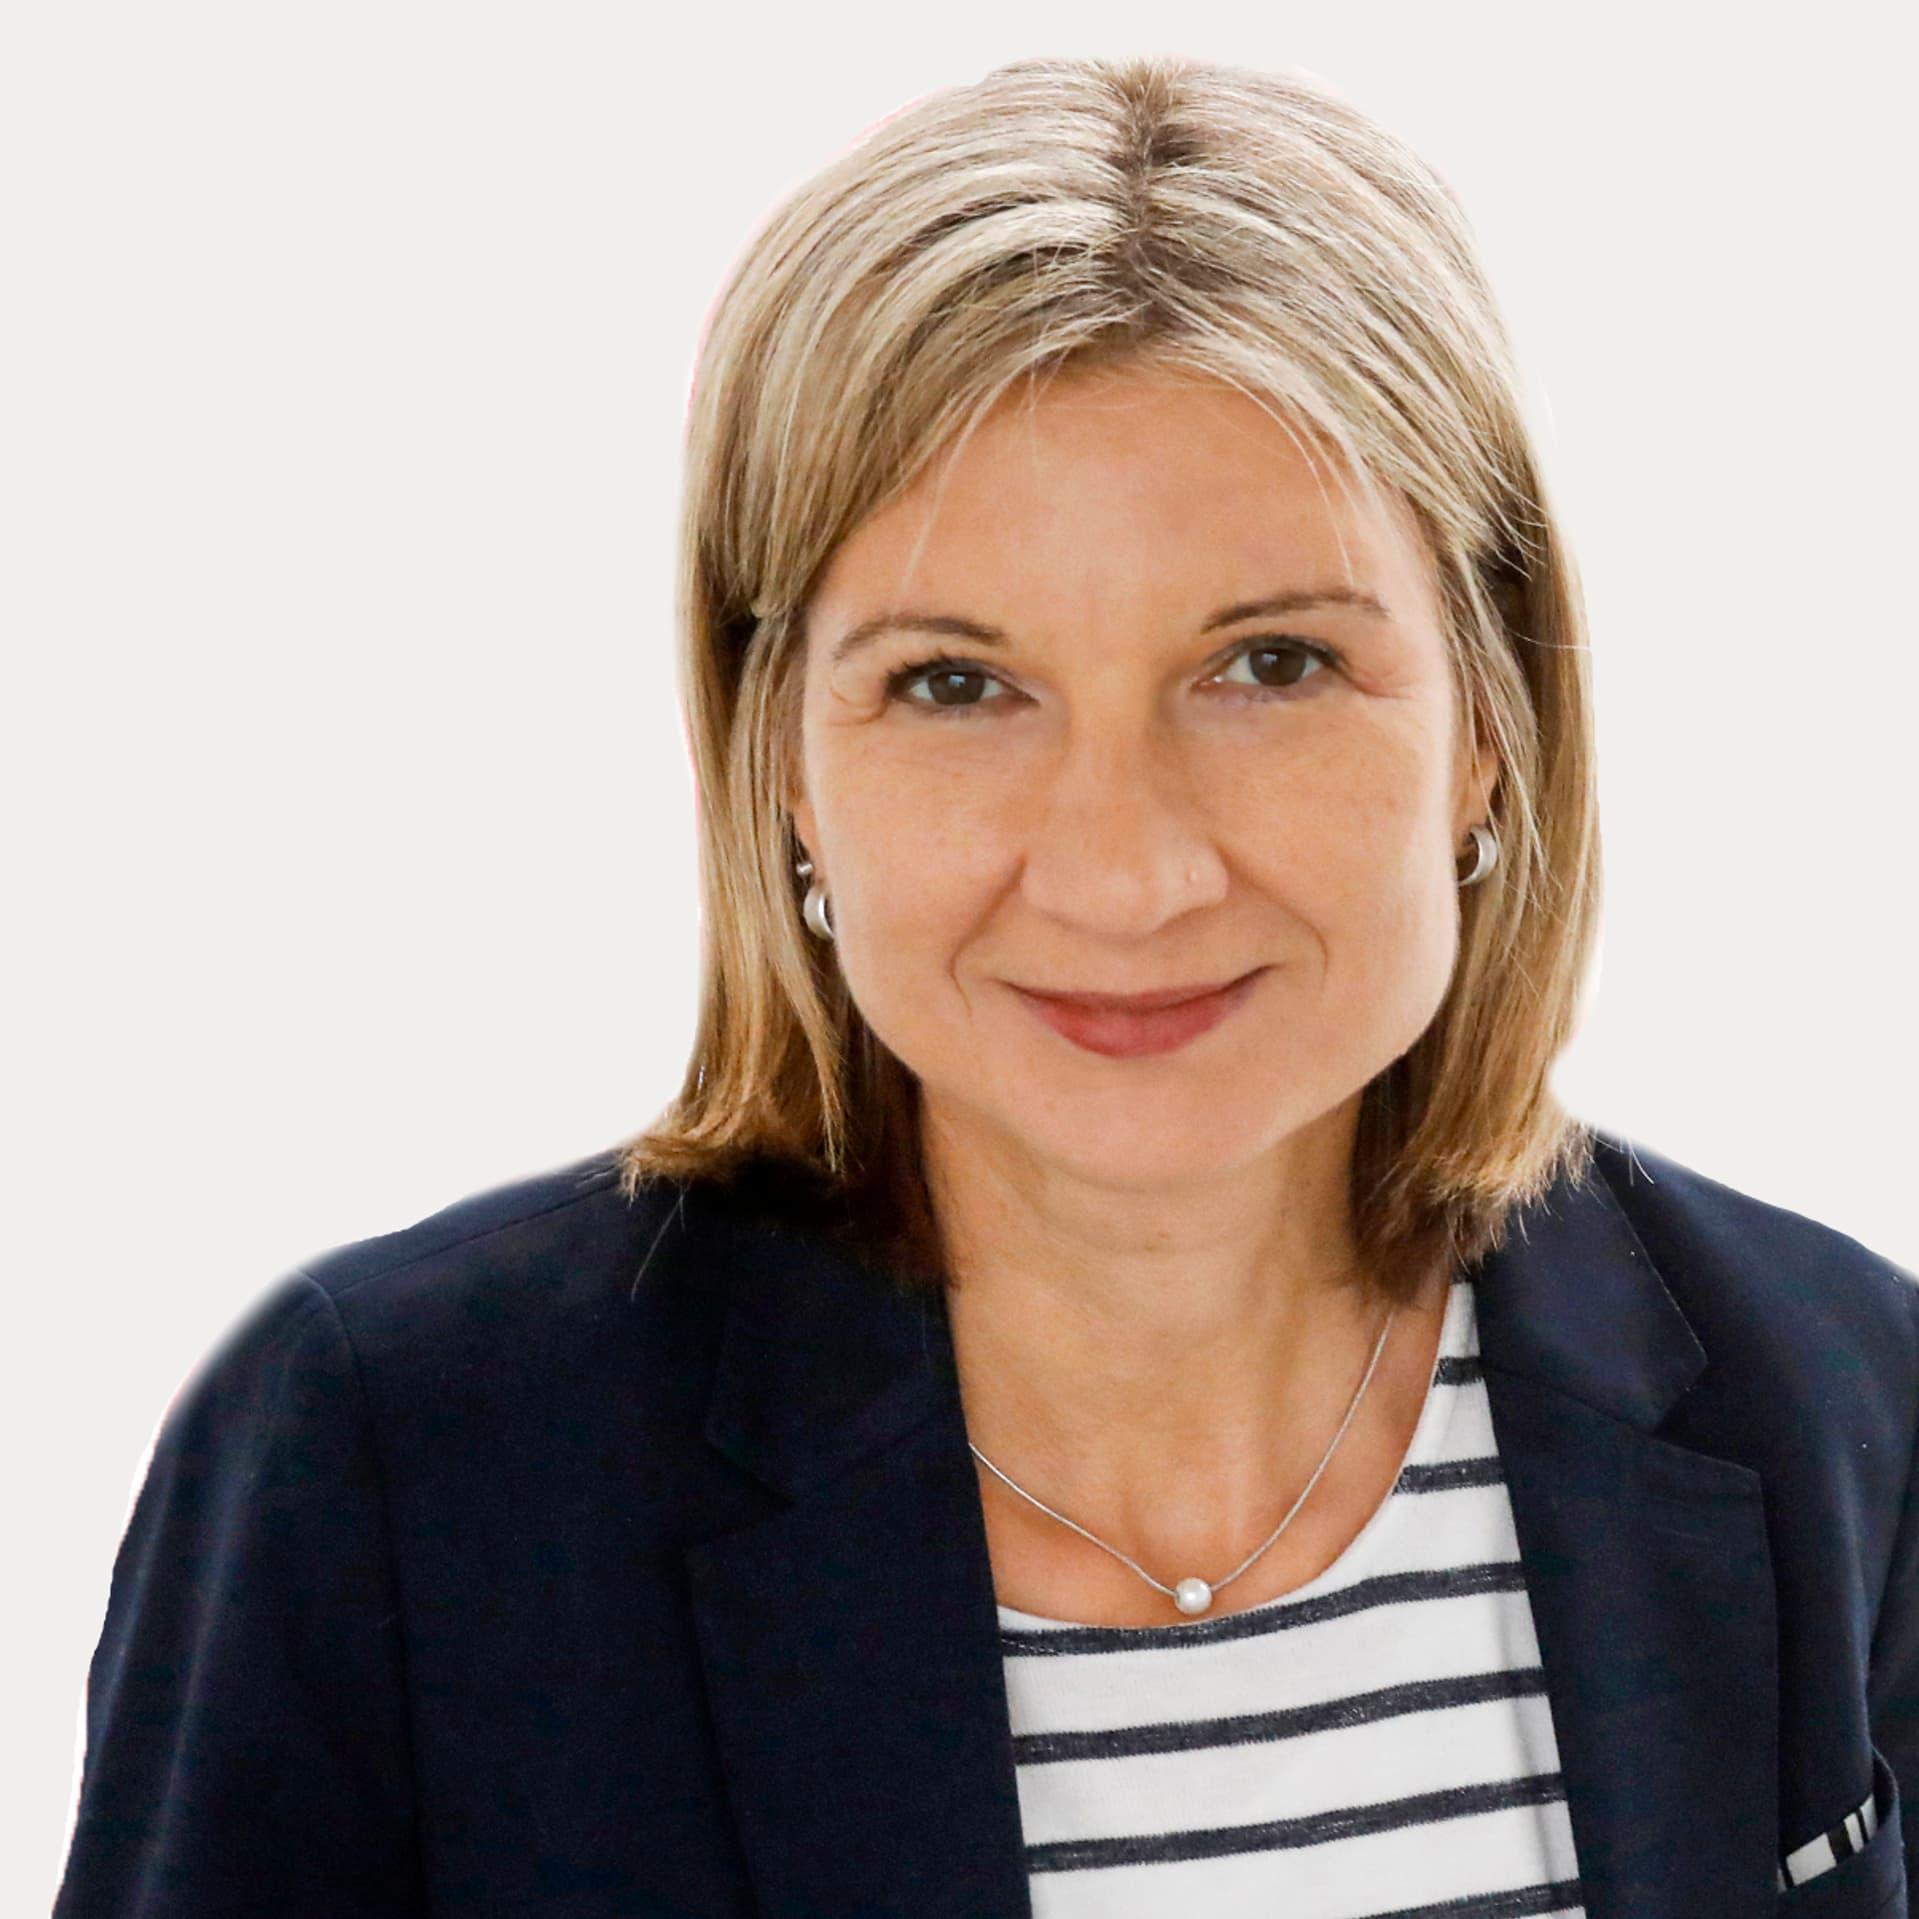 Manuela Jakobi